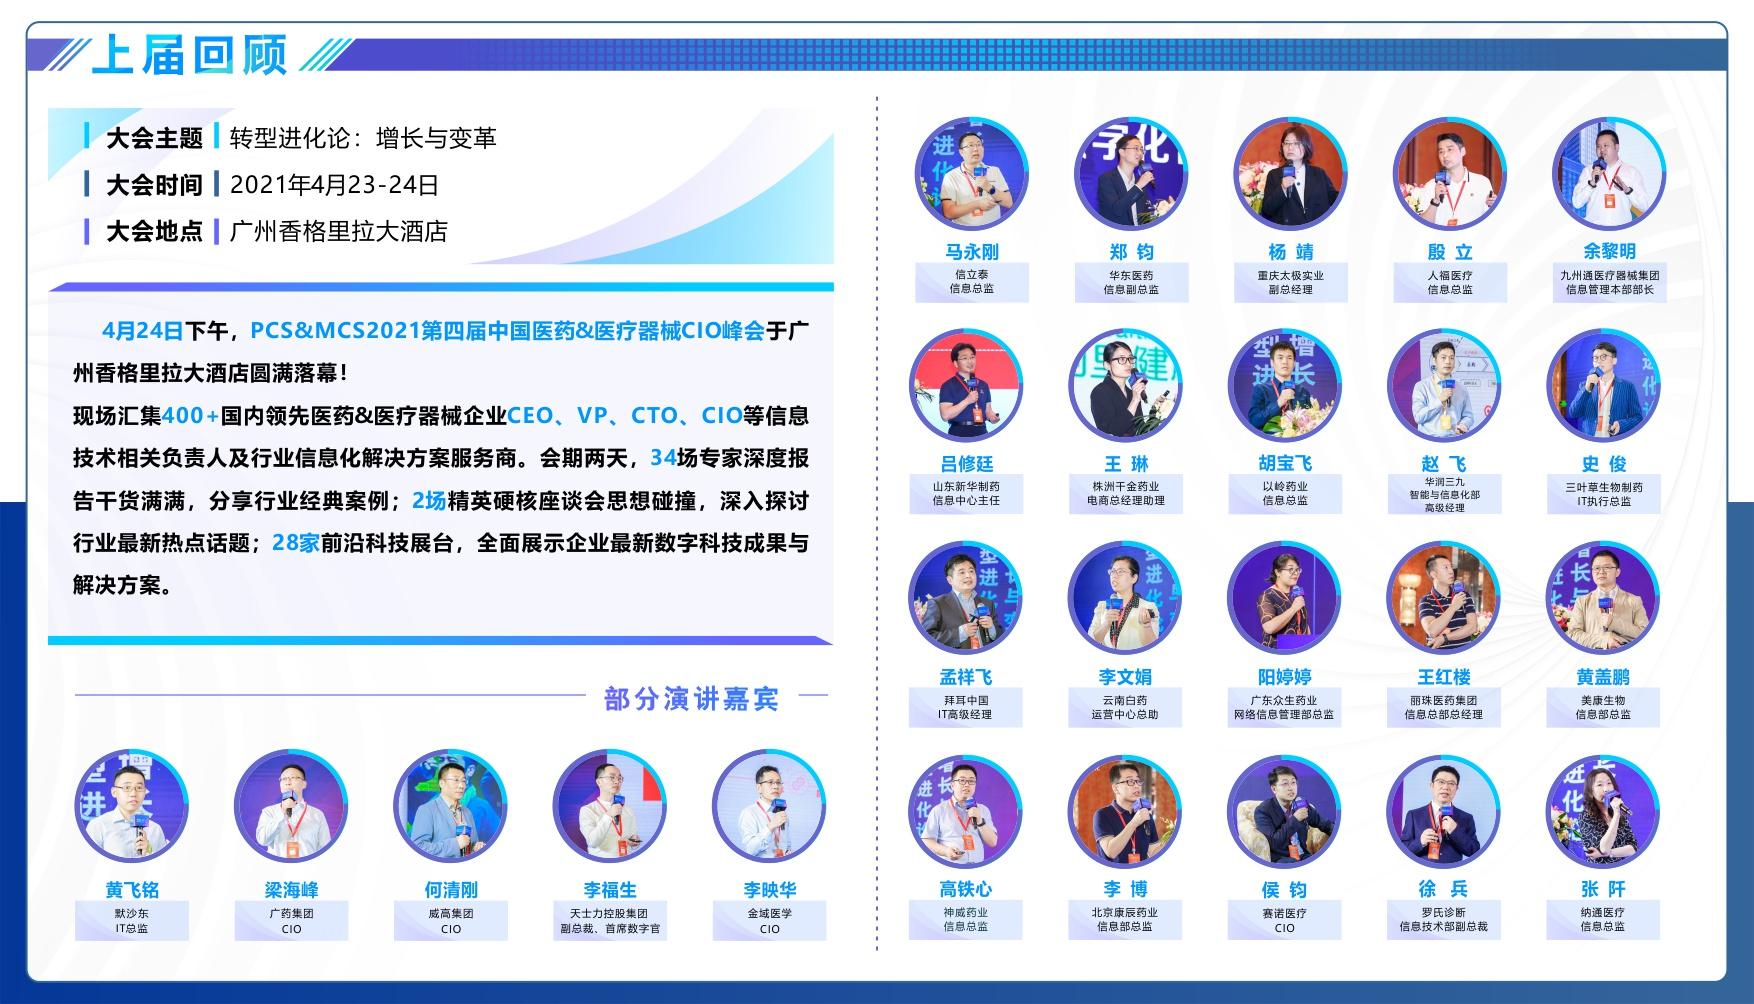 MDT 2021中国医药健康数字科技大会